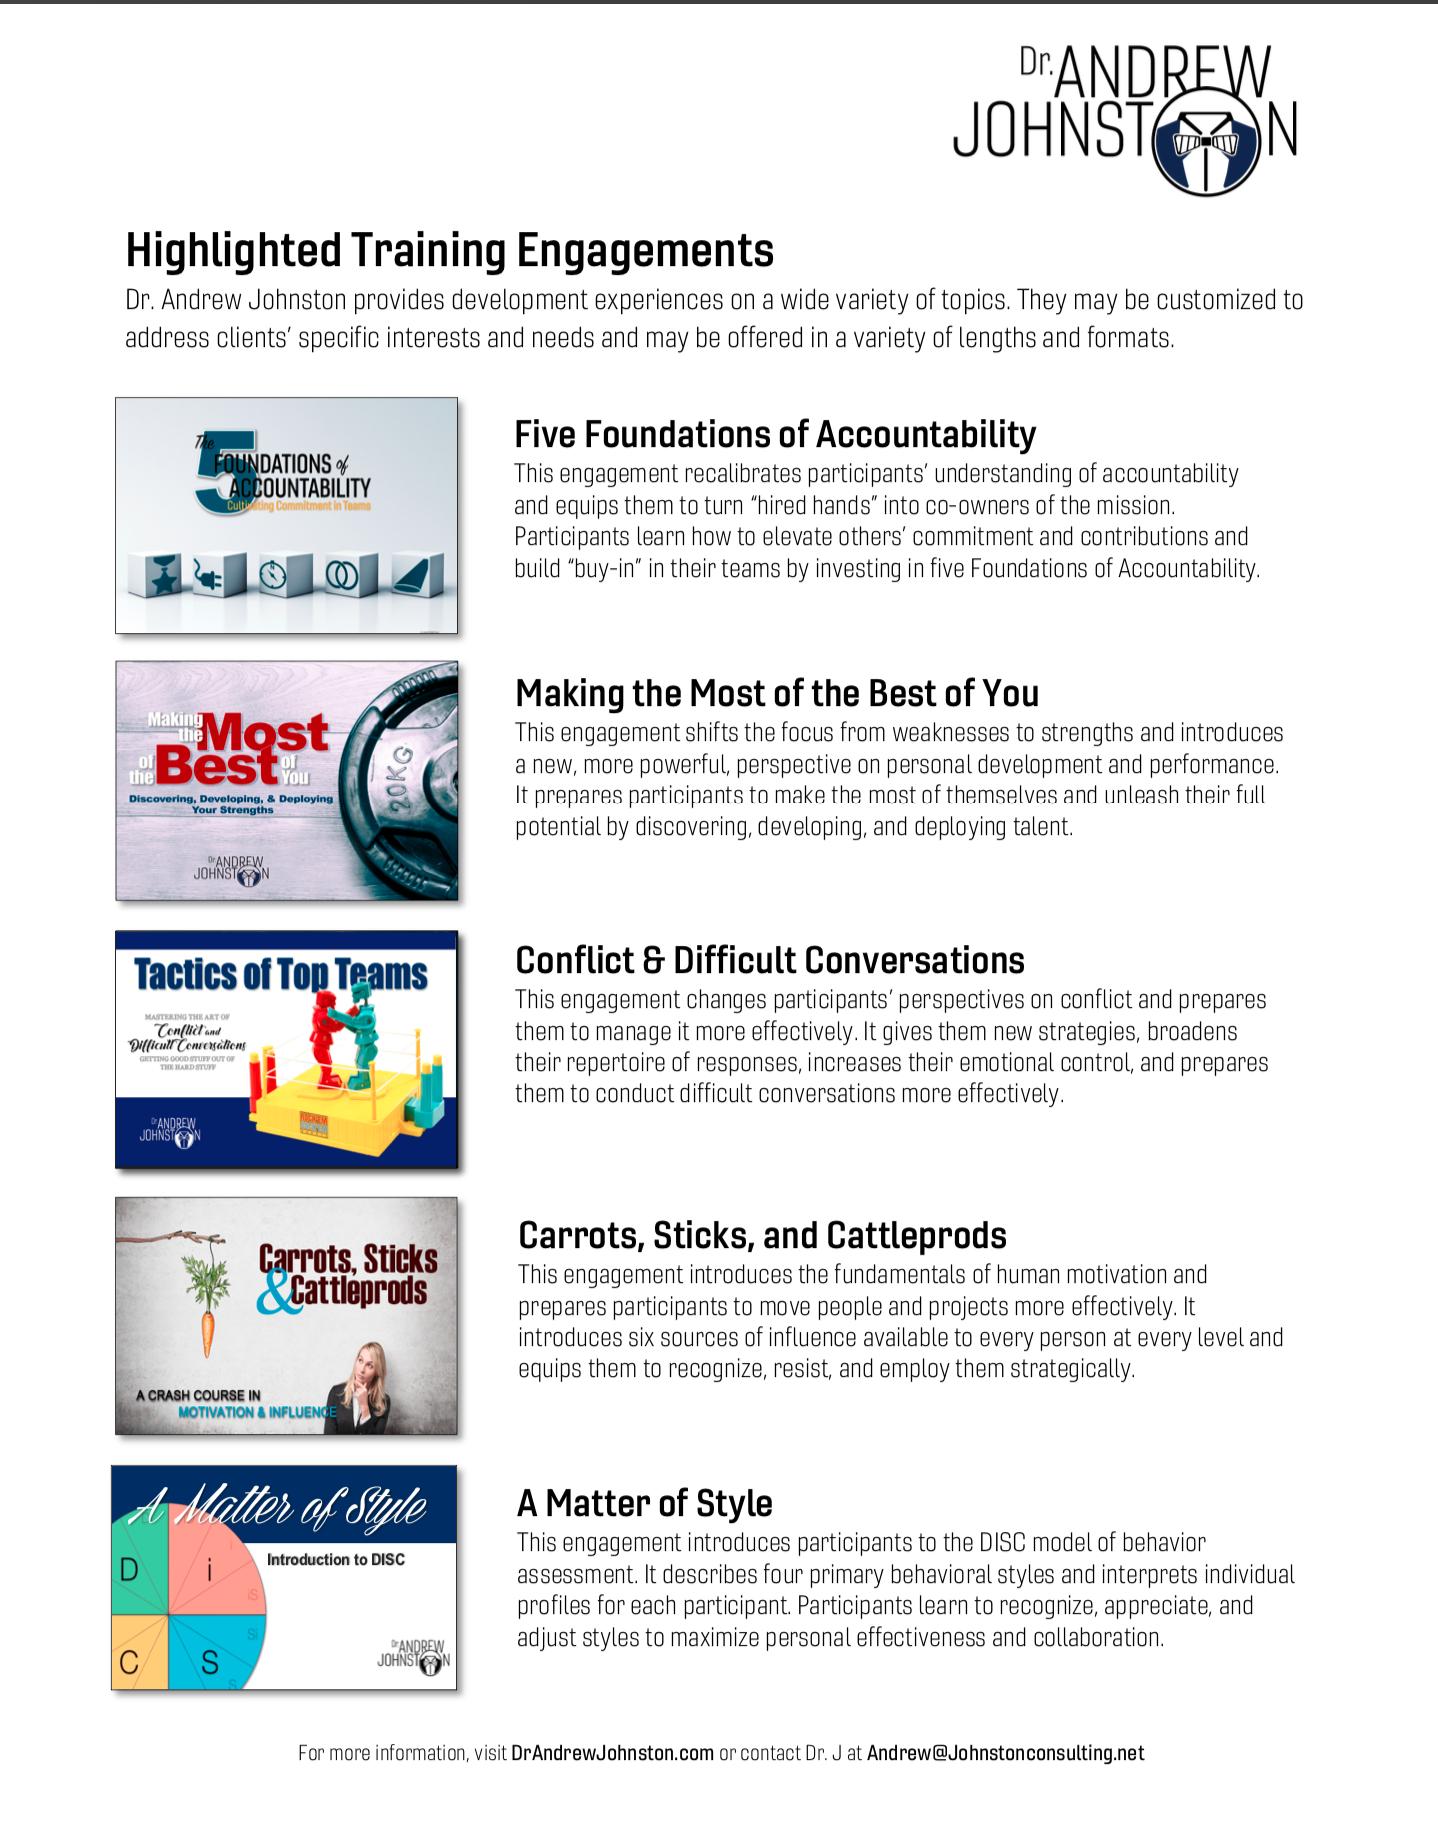 Highlighted Training Programs